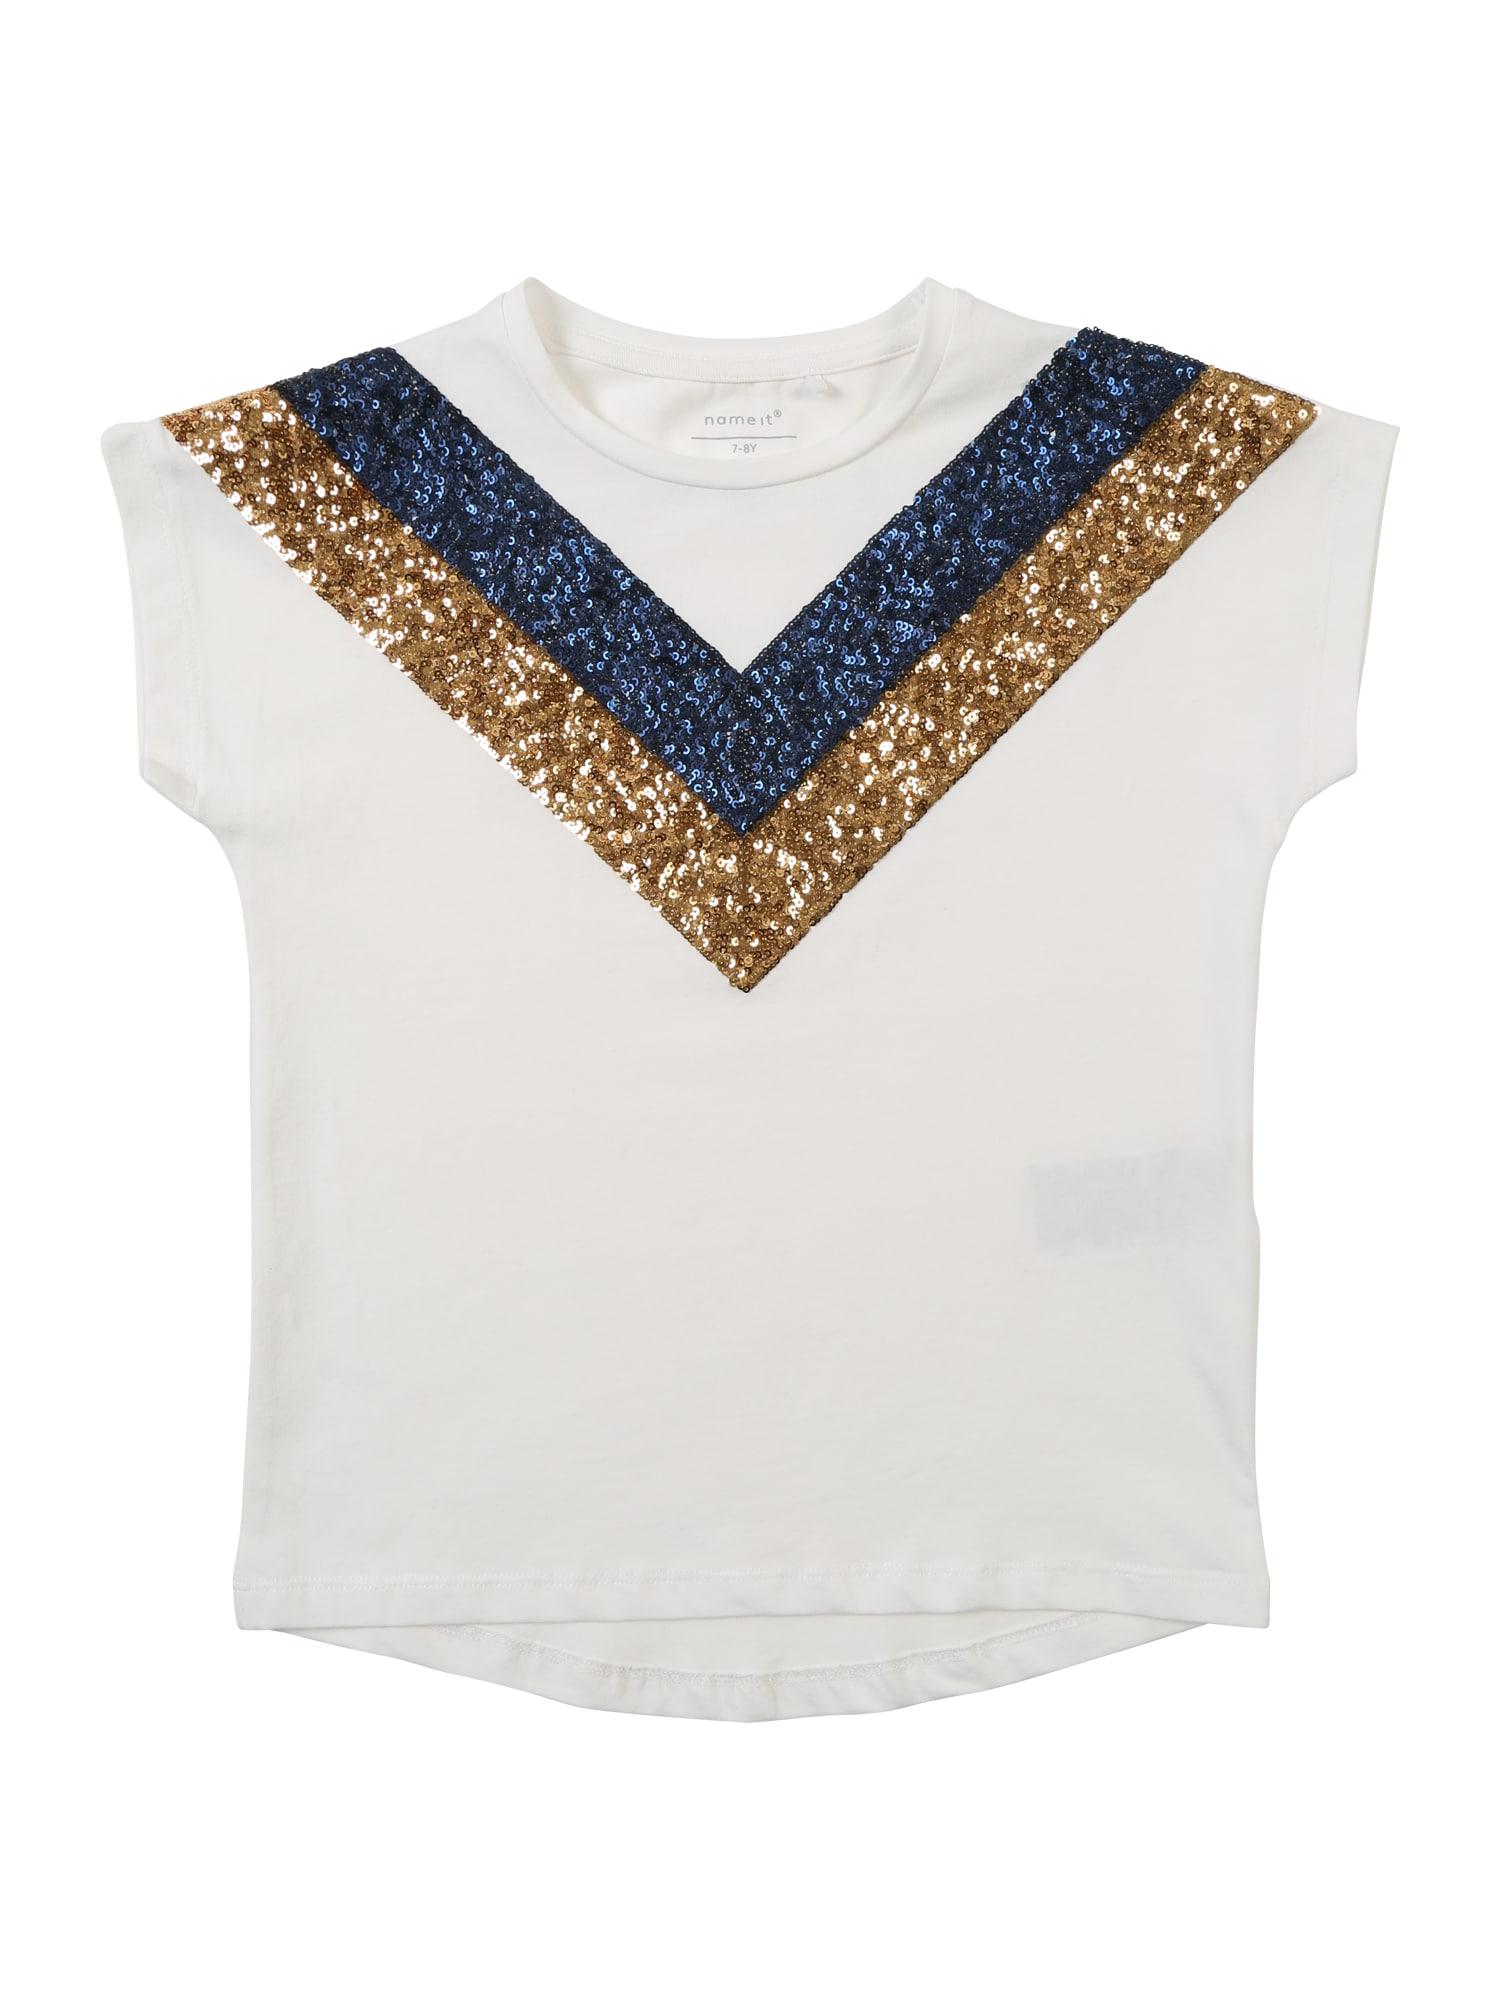 Tričko NKFKRISTBJORG tmavě modrá zlatá bílá NAME IT